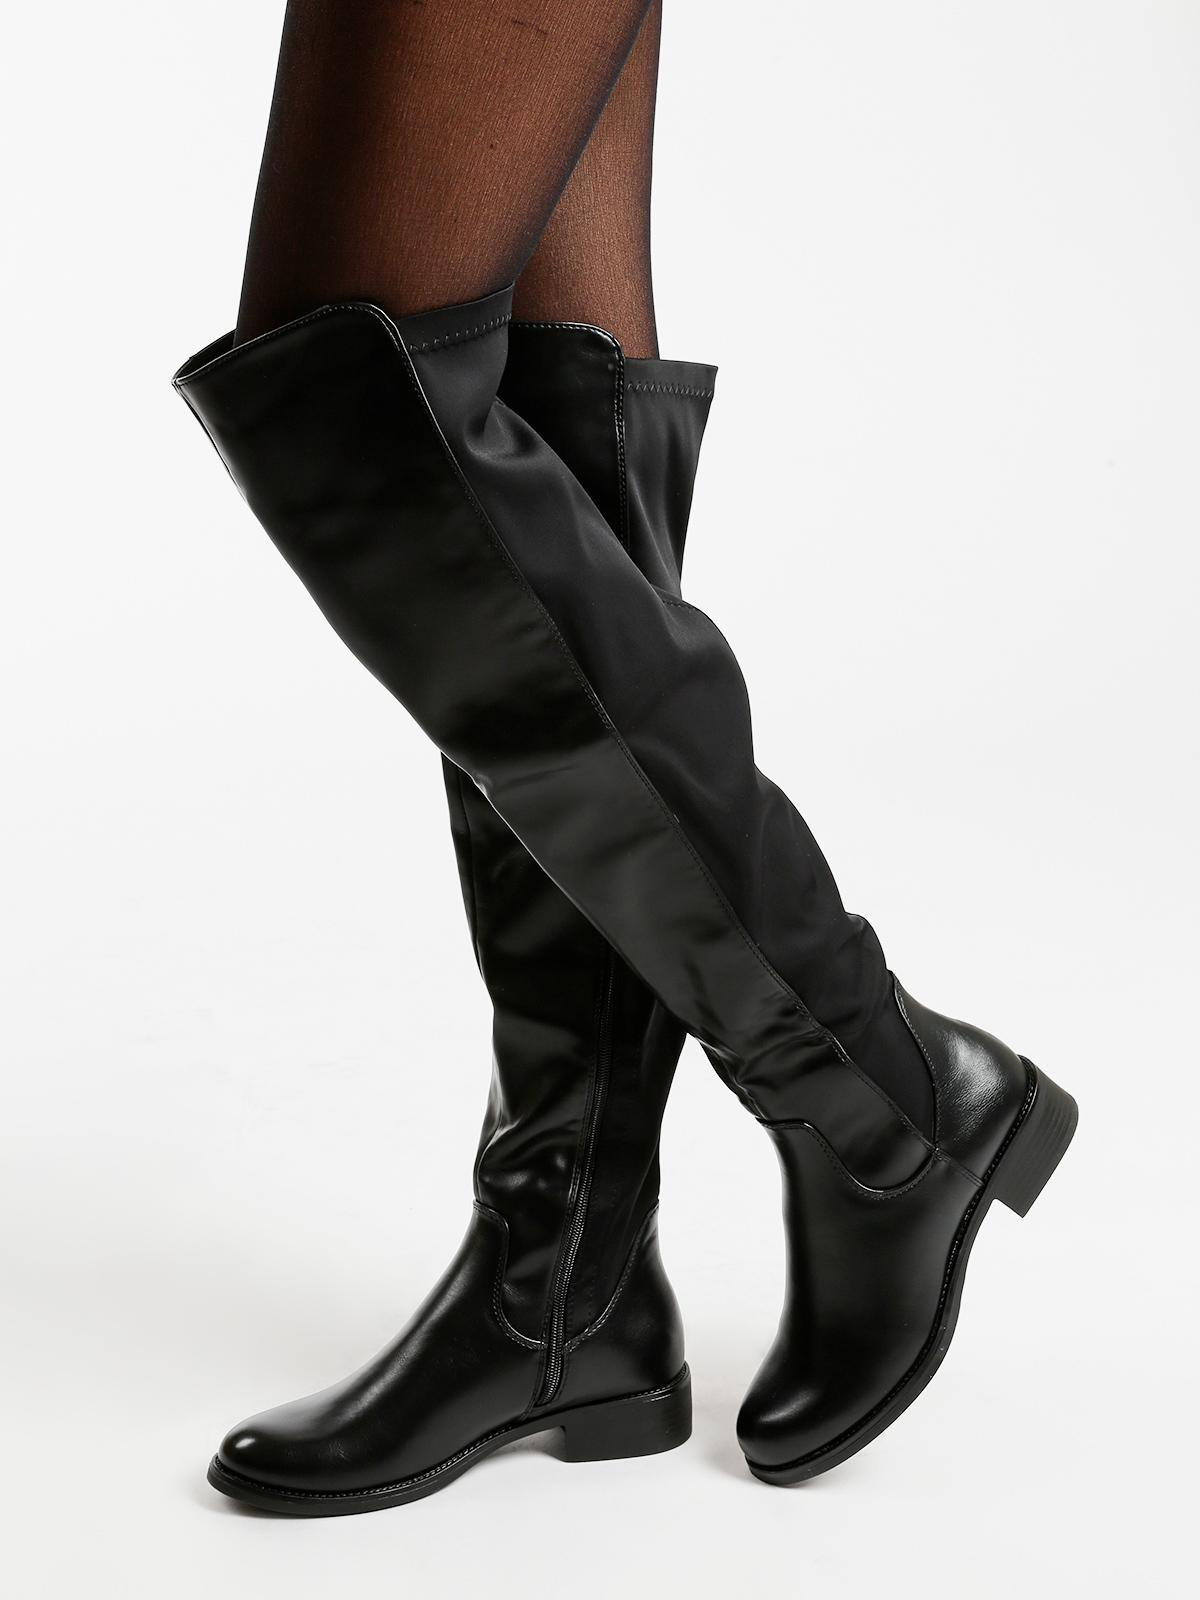 d44bb3199f Stivali al ginocchio bassi diamantique | MecShopping